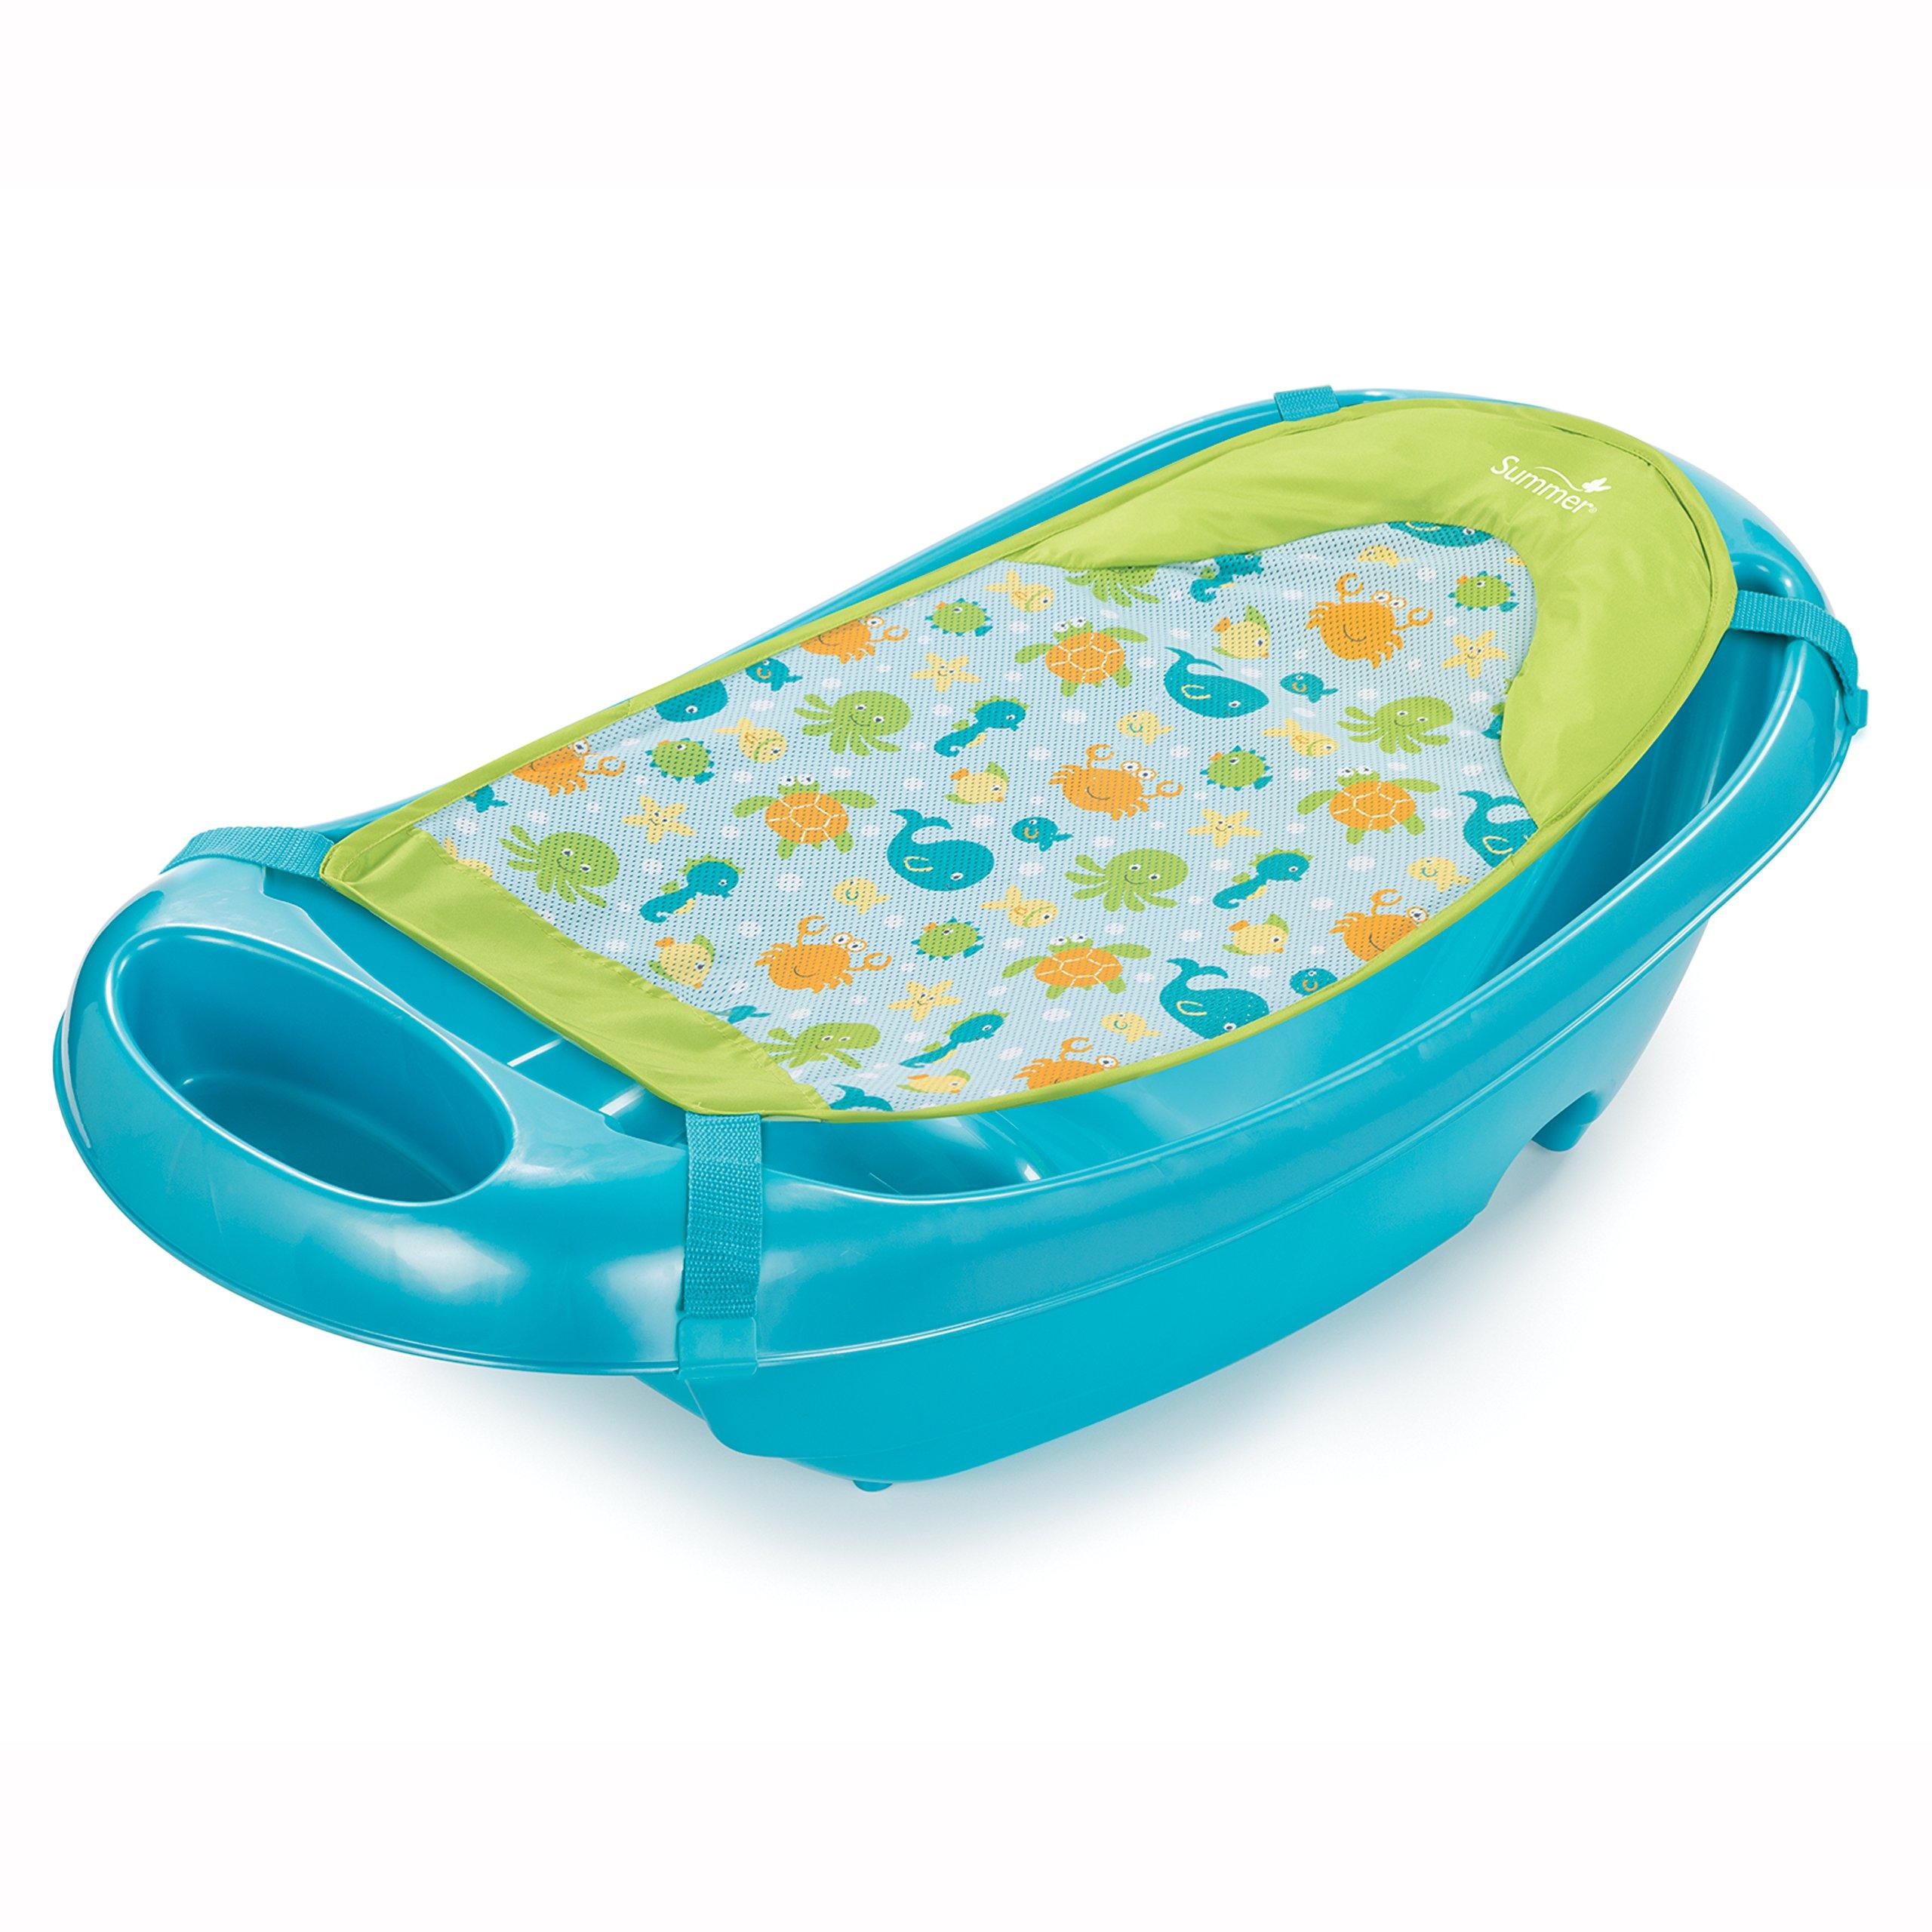 Summer Infant Splish 'n Splash Newborn to Toddler Tub, Blue by Summer Infant